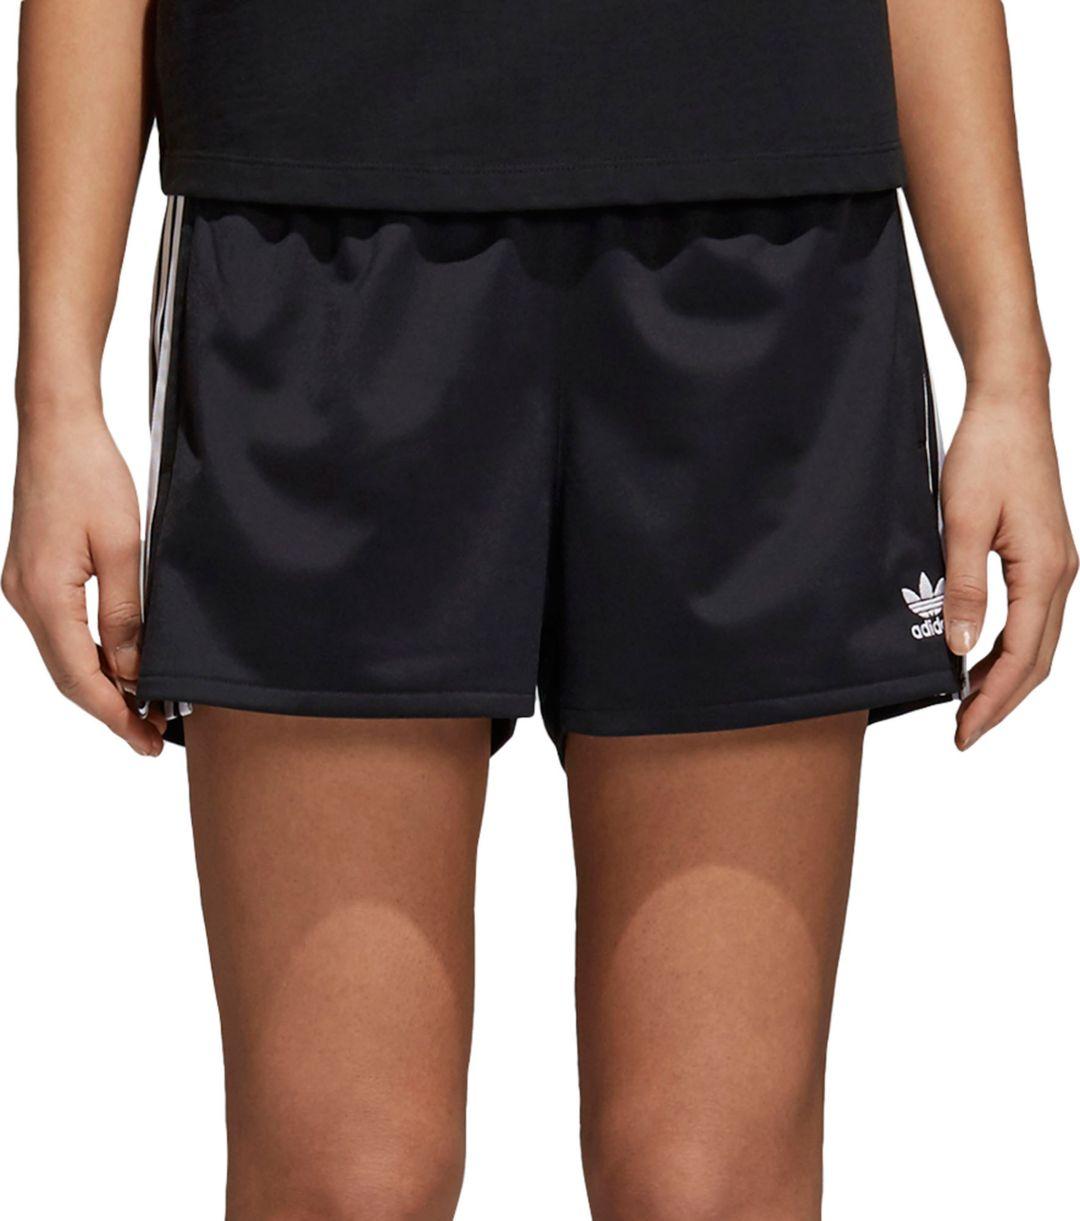 f4b5280c8 adidas Originals Women's 3-Stripes Shorts   DICK'S Sporting Goods